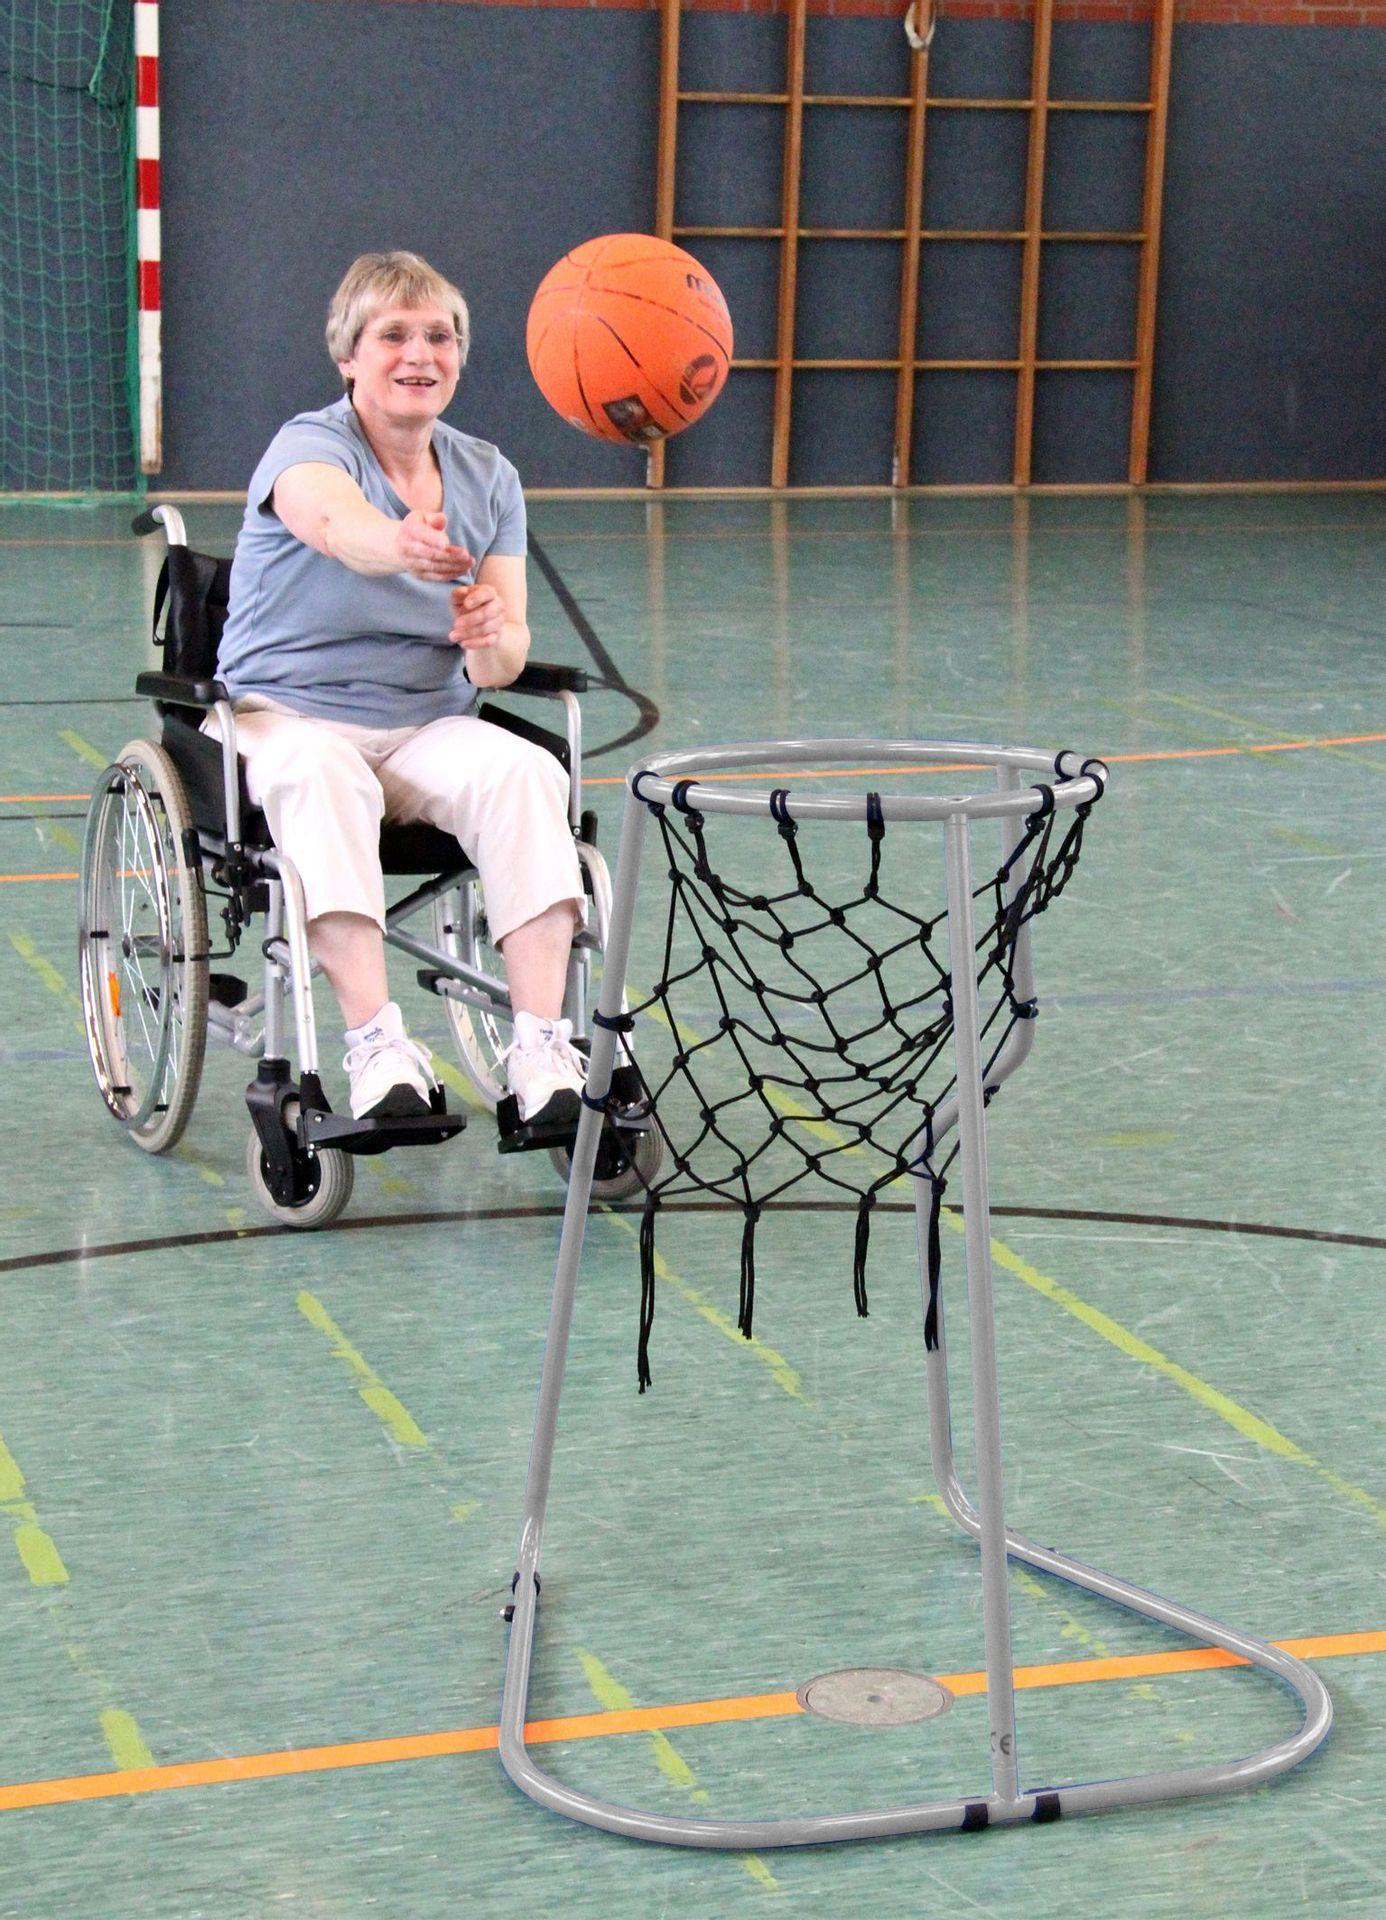 Basketballständer - Dunking